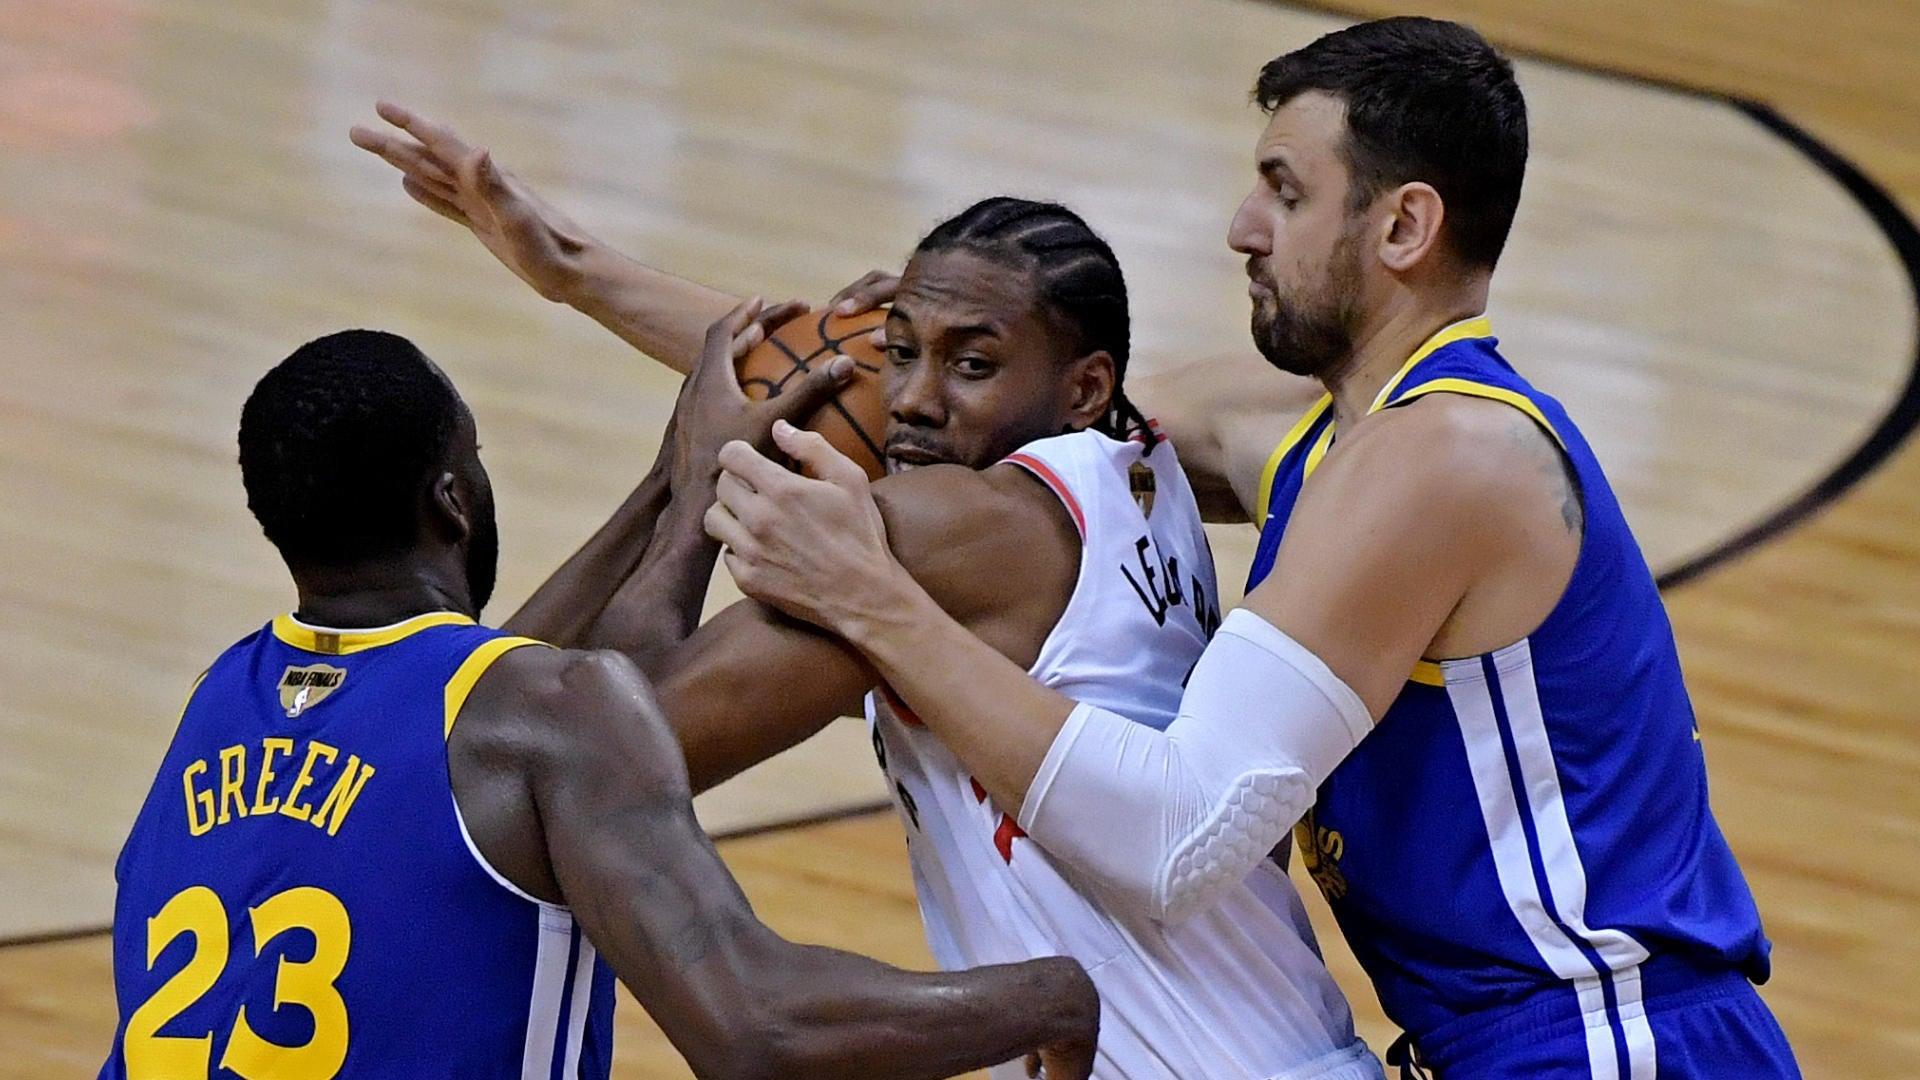 2019 NBA Finals: Warriors claim most impressive win of postseason in Game 2 comeback against Raptors